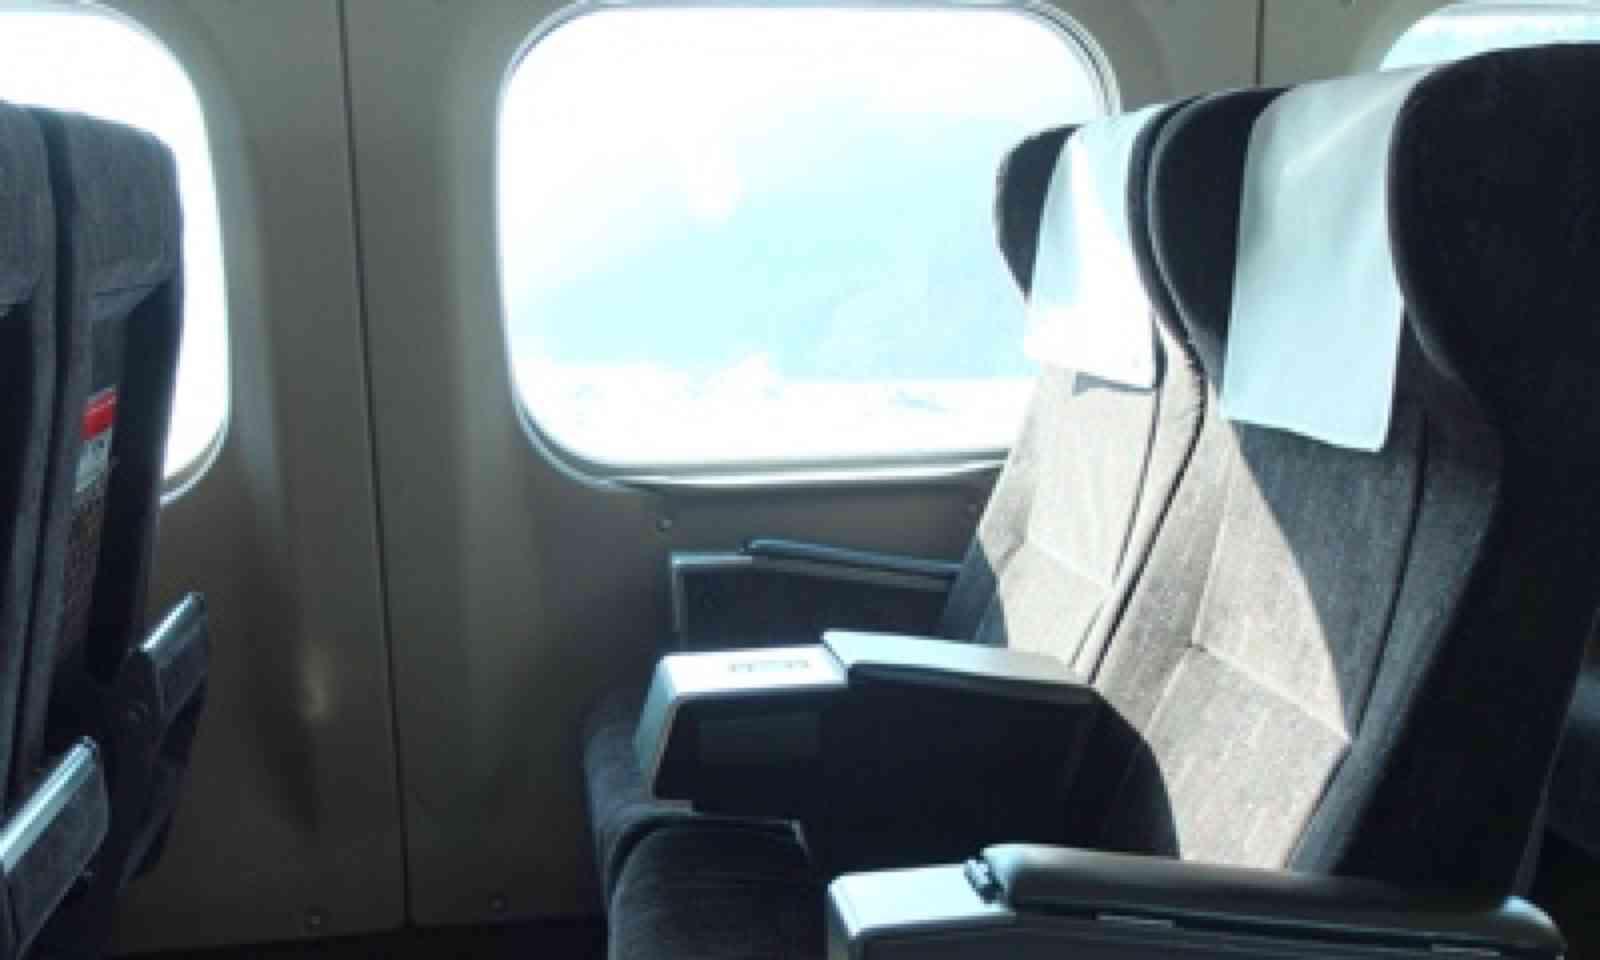 Inside the Tokaido Shinkansen (Matthew Woodward)